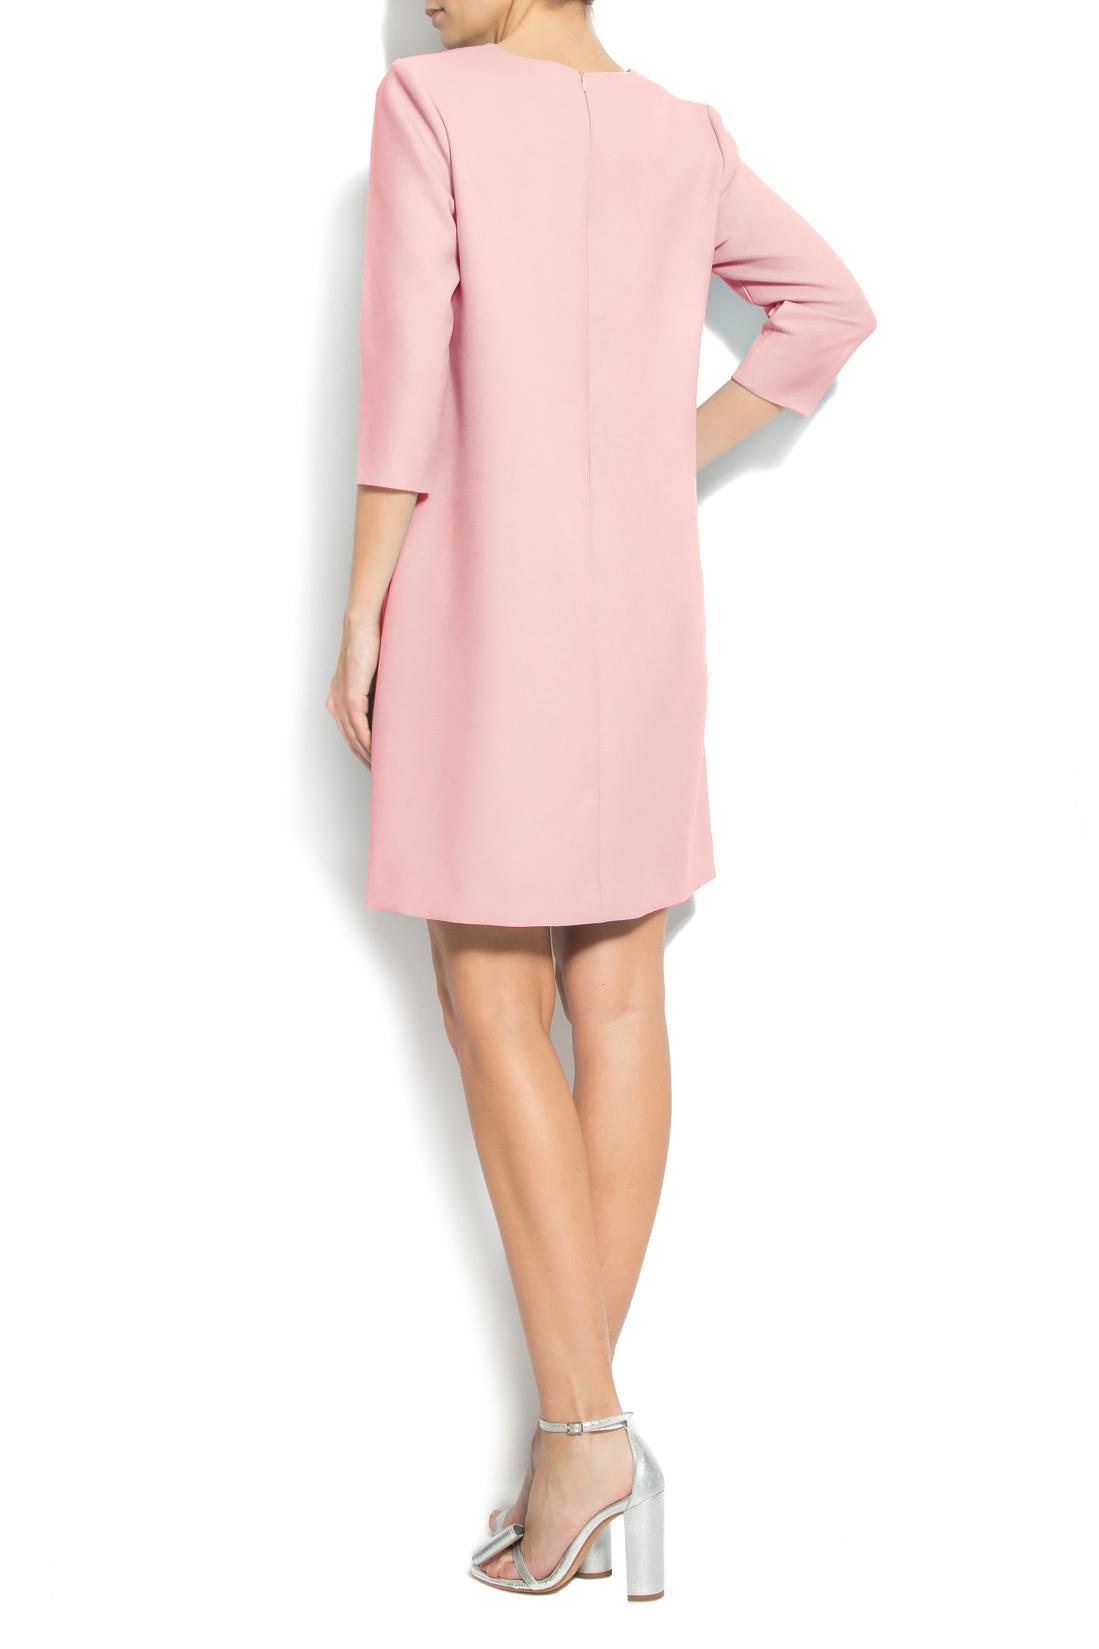 Crepe mini dress Claudia Castrase image 2